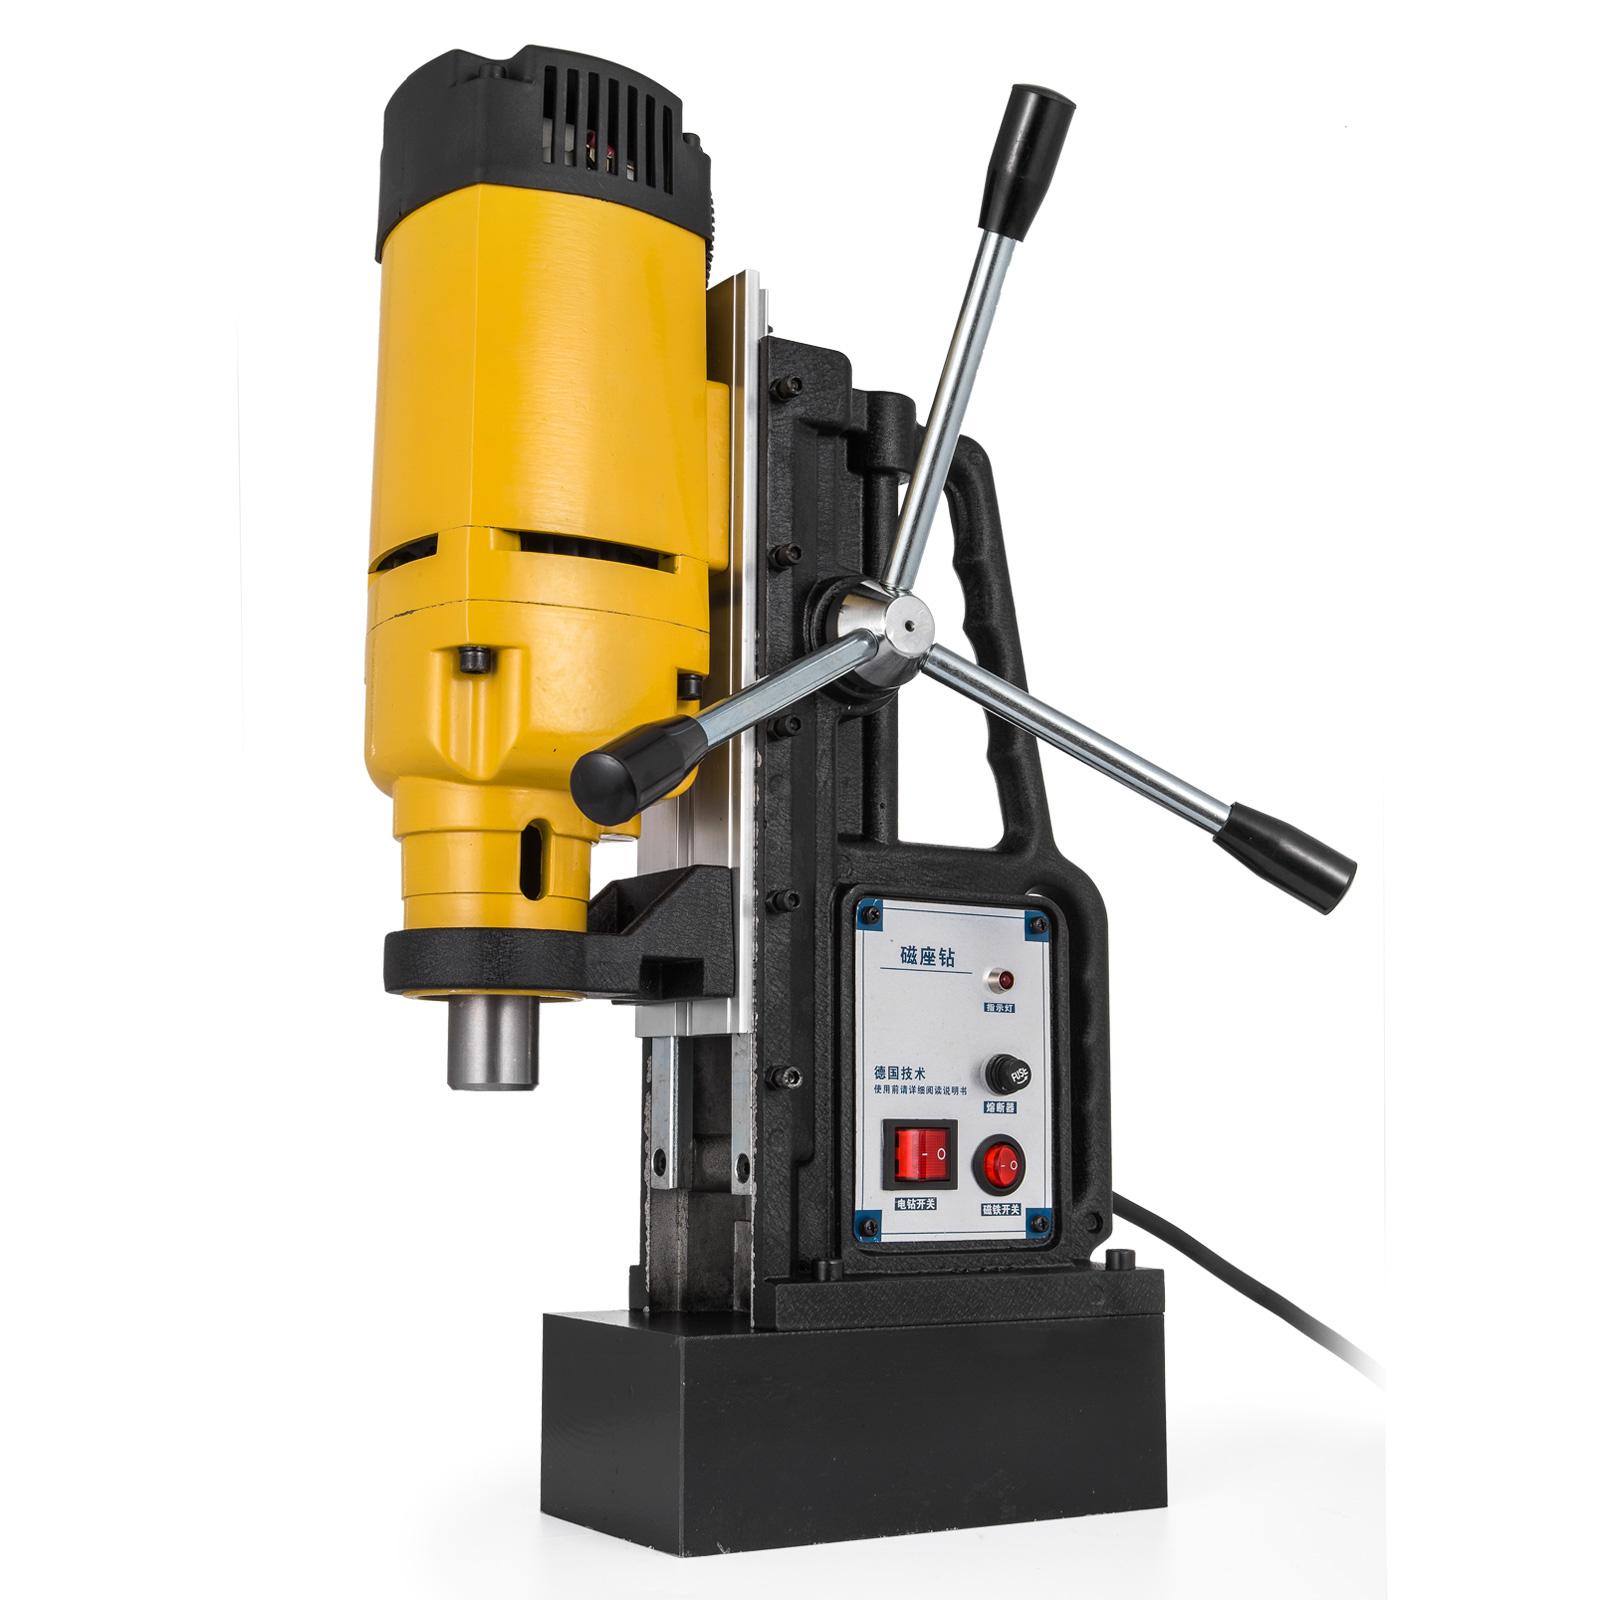 MB23-BRM35-MD40-Trapano-Perforatrice-Carotatore-Fresa-Magnetico-12-40mm-230V miniatura 54